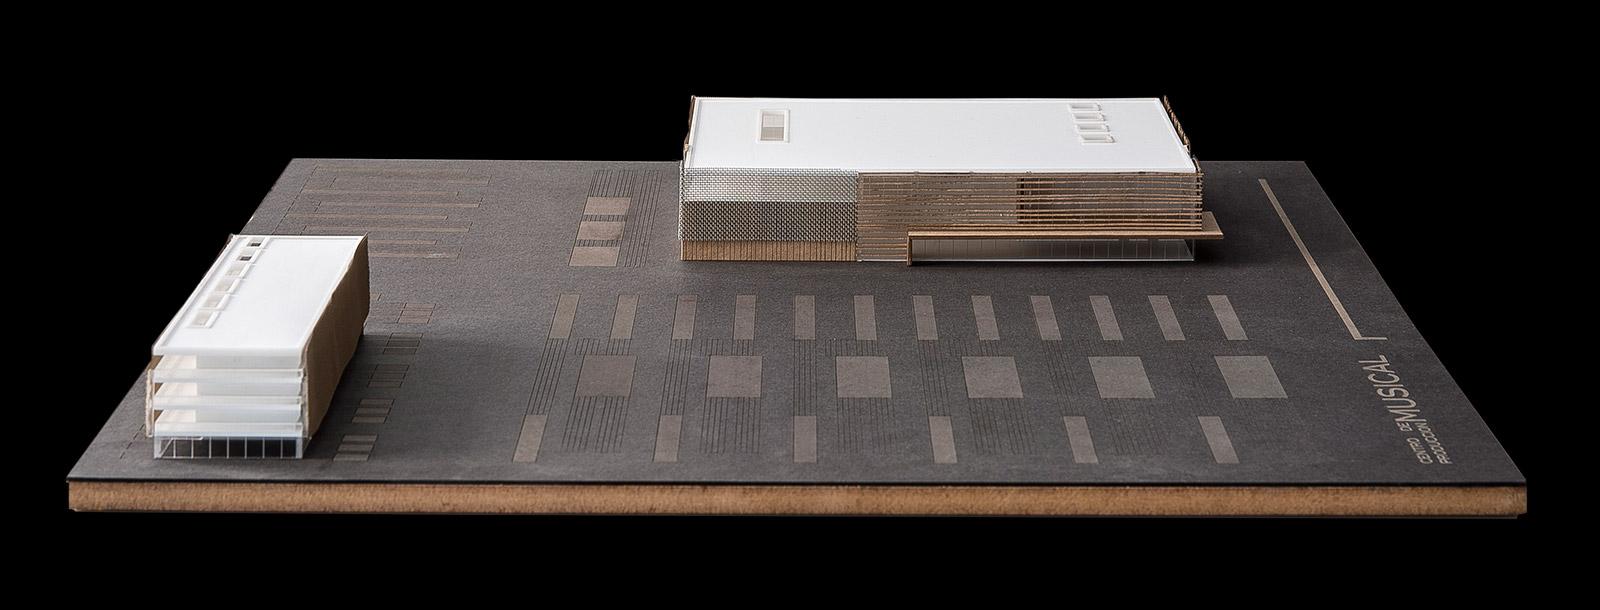 maqueta-arquitectura-architecture-model-tfg-etsav-upv-centro-de-produccion-musical-arquimaqueta-valencia-5